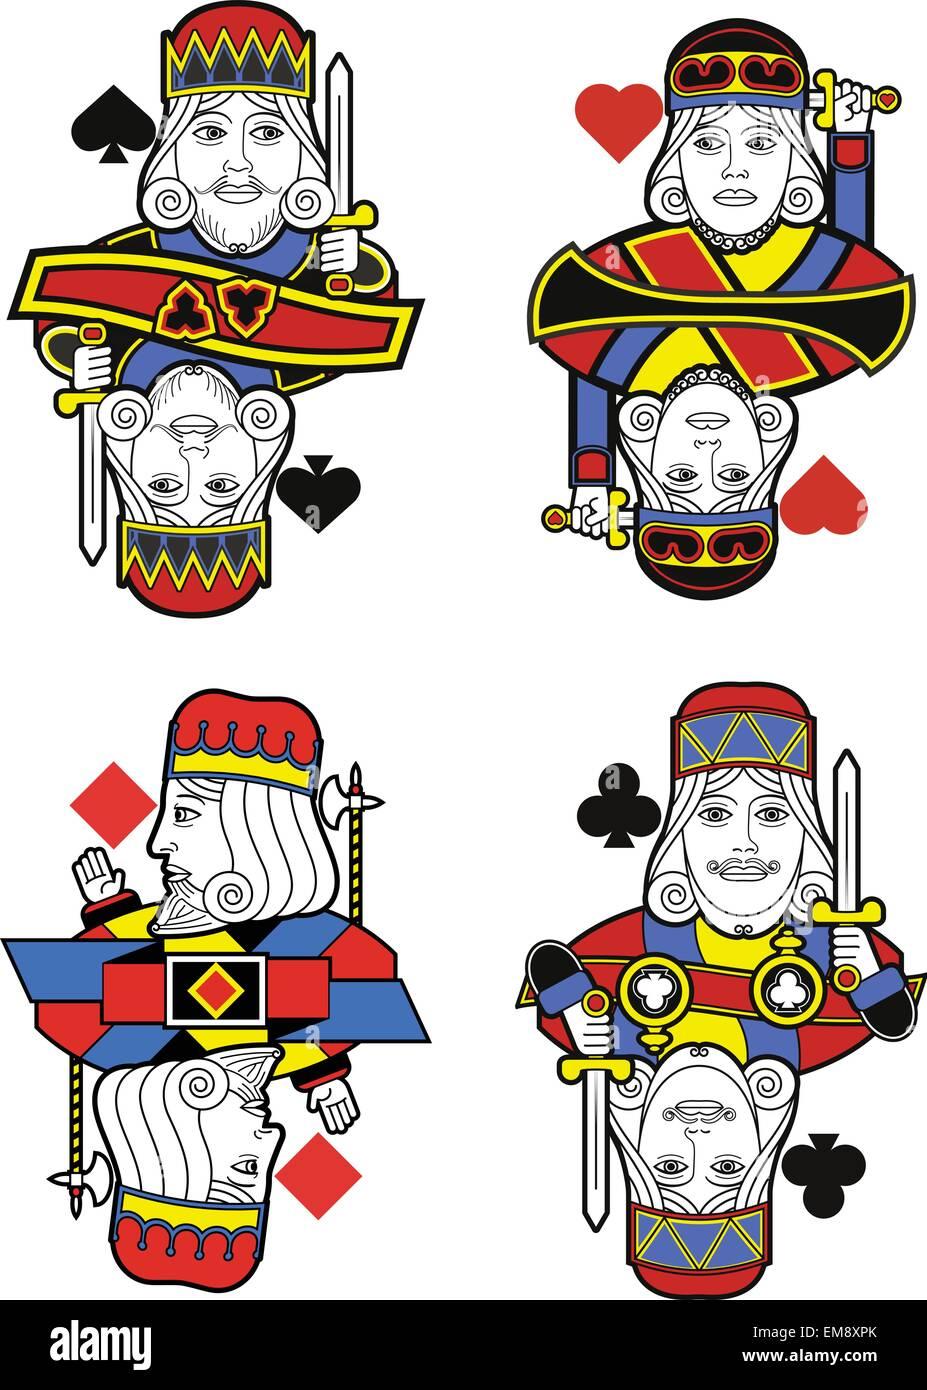 Quatre rois sans cartes. Design original Photo Stock